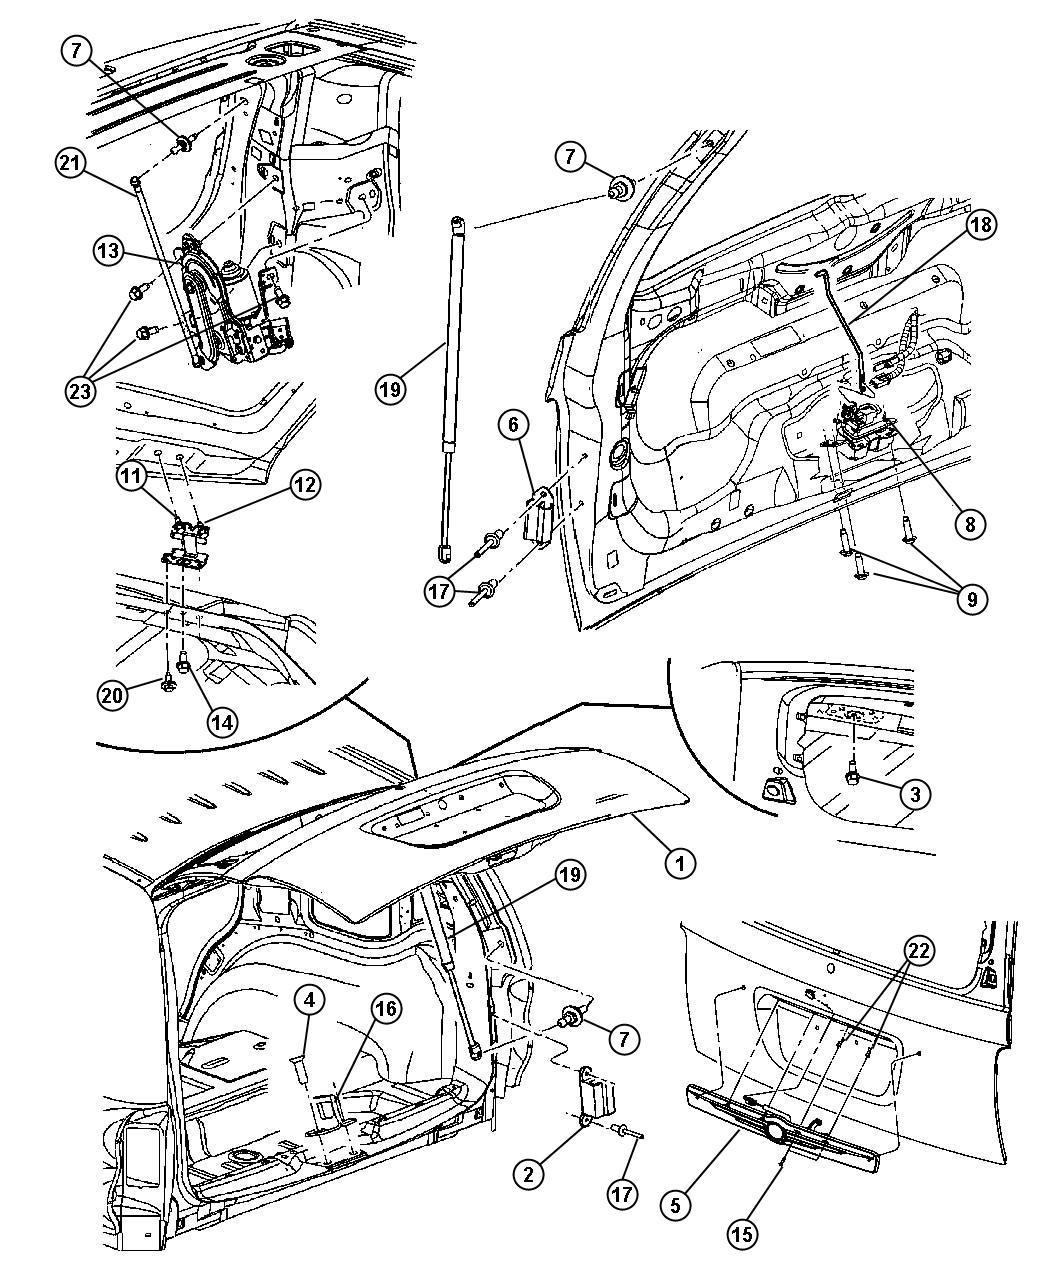 2008 Dodge Durango Rod. Liftgate handle to latch